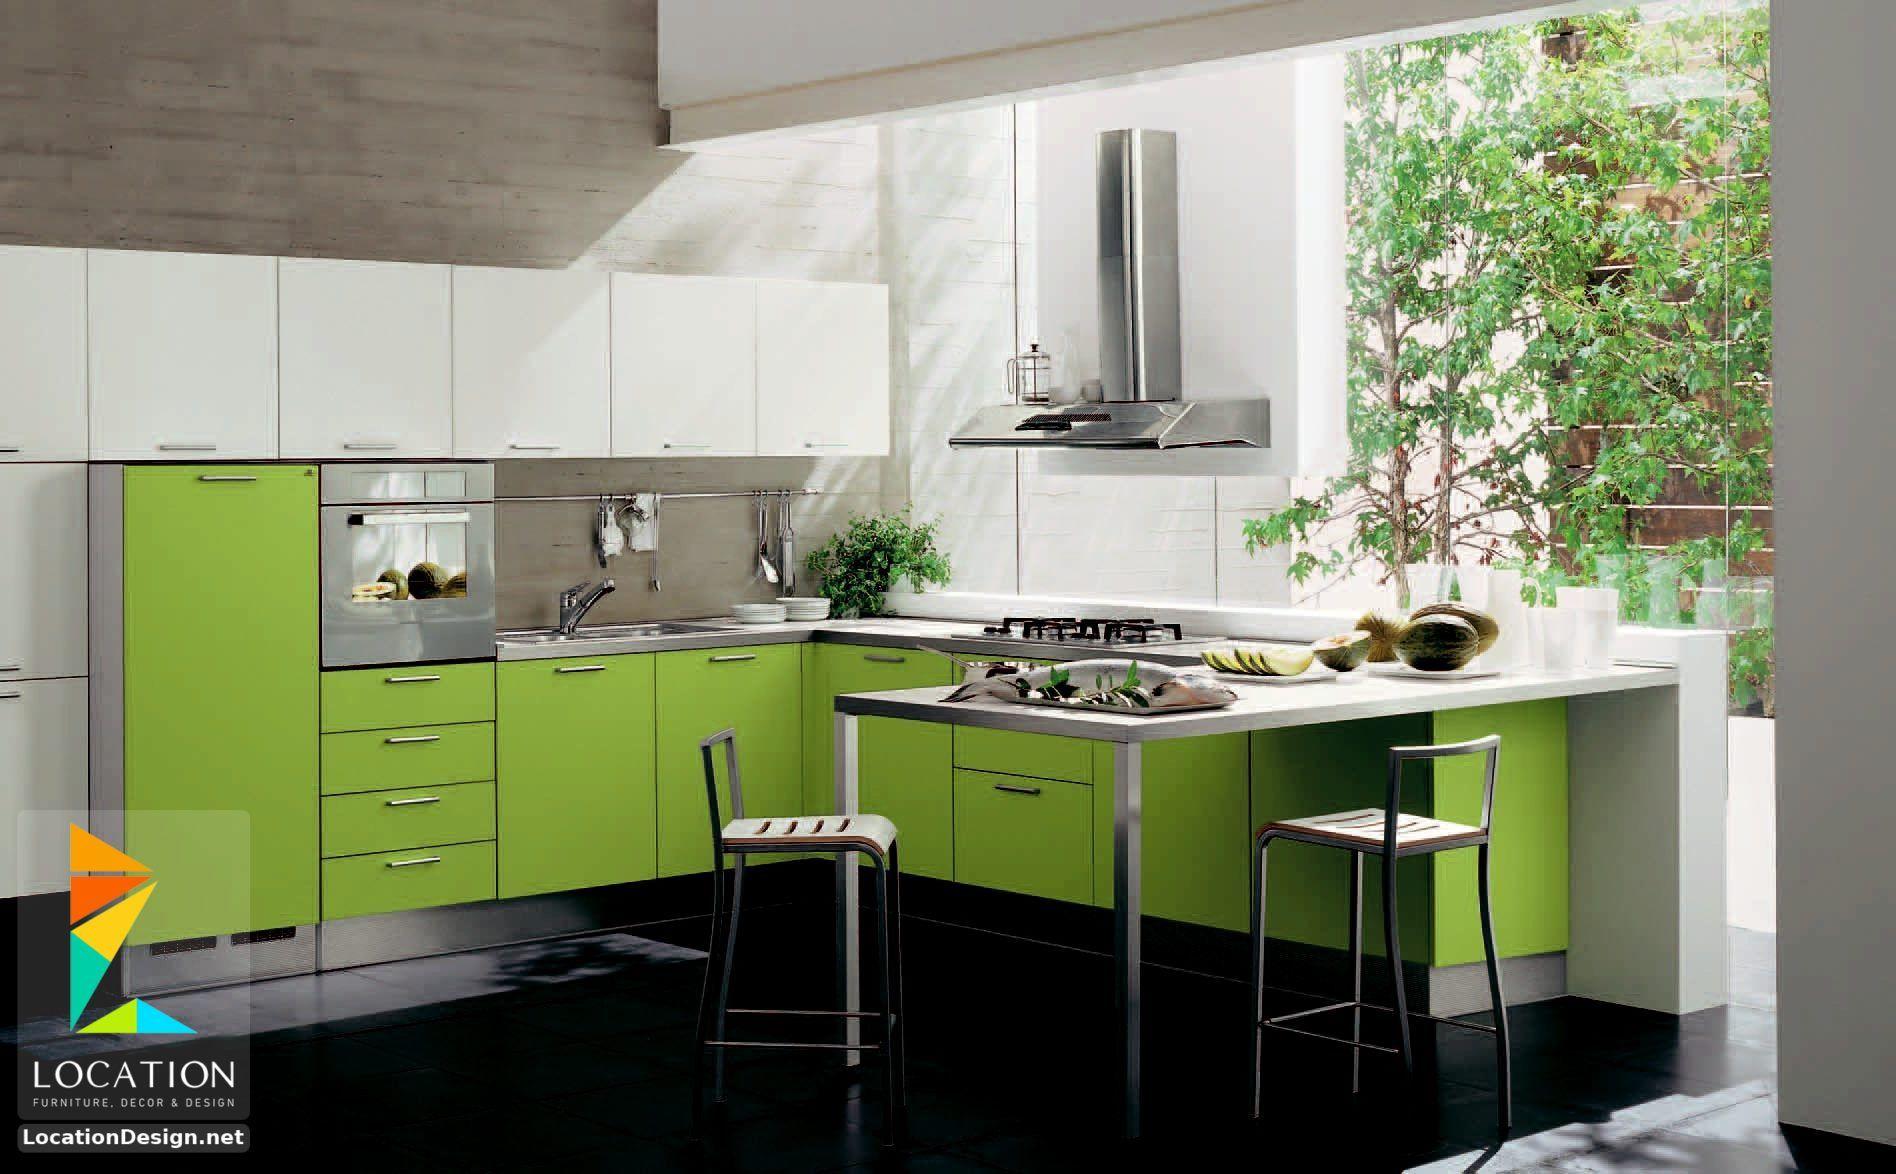 ديكورات مطابخ مودرن صغيرة 2019 2020 Green Kitchen Appliances Minimalist Kitchen Design Green Kitchen Cabinets